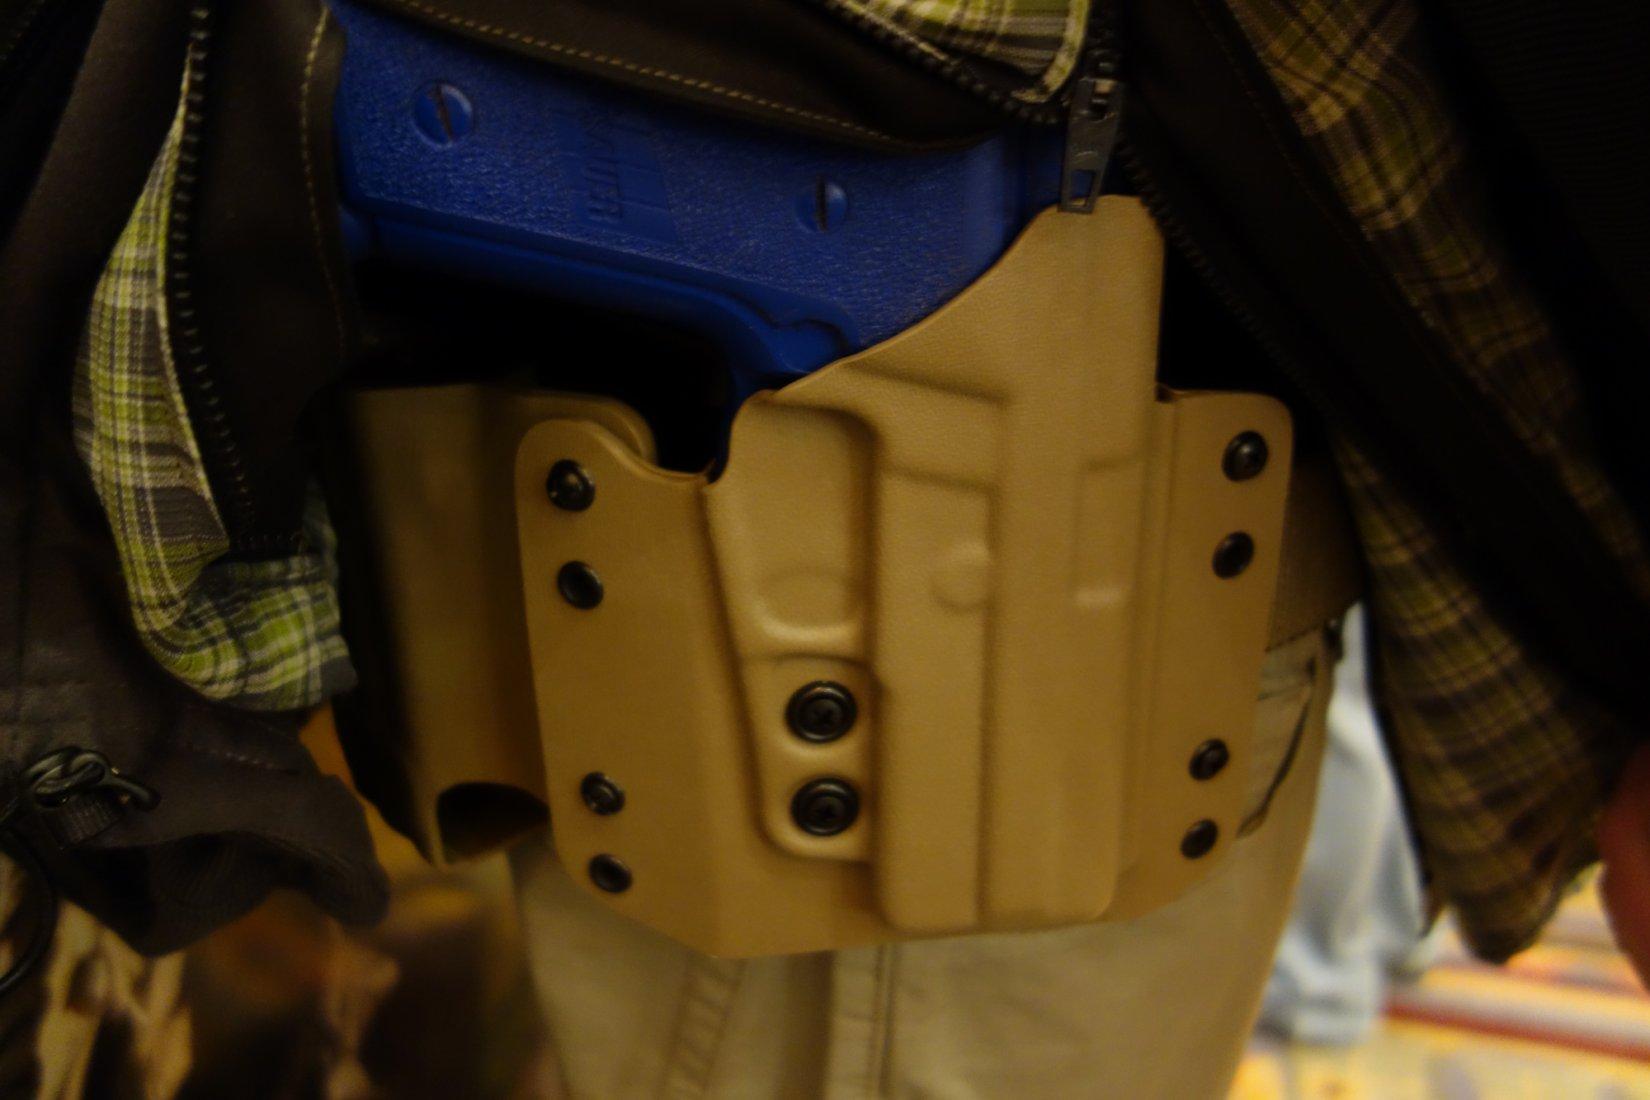 High Threat Concealment HTC Low Profile System LPS Modular Gunfighting Belt Carrier System Tactical Gun Belt David Crane DefenseReview.com DR 1 High Threat Concealment HTC Low Profile System (LPS) Modular Gunfighting Belt/Carrier System for Lo Pro/Lo Vis Tactical Ops! (Video!)